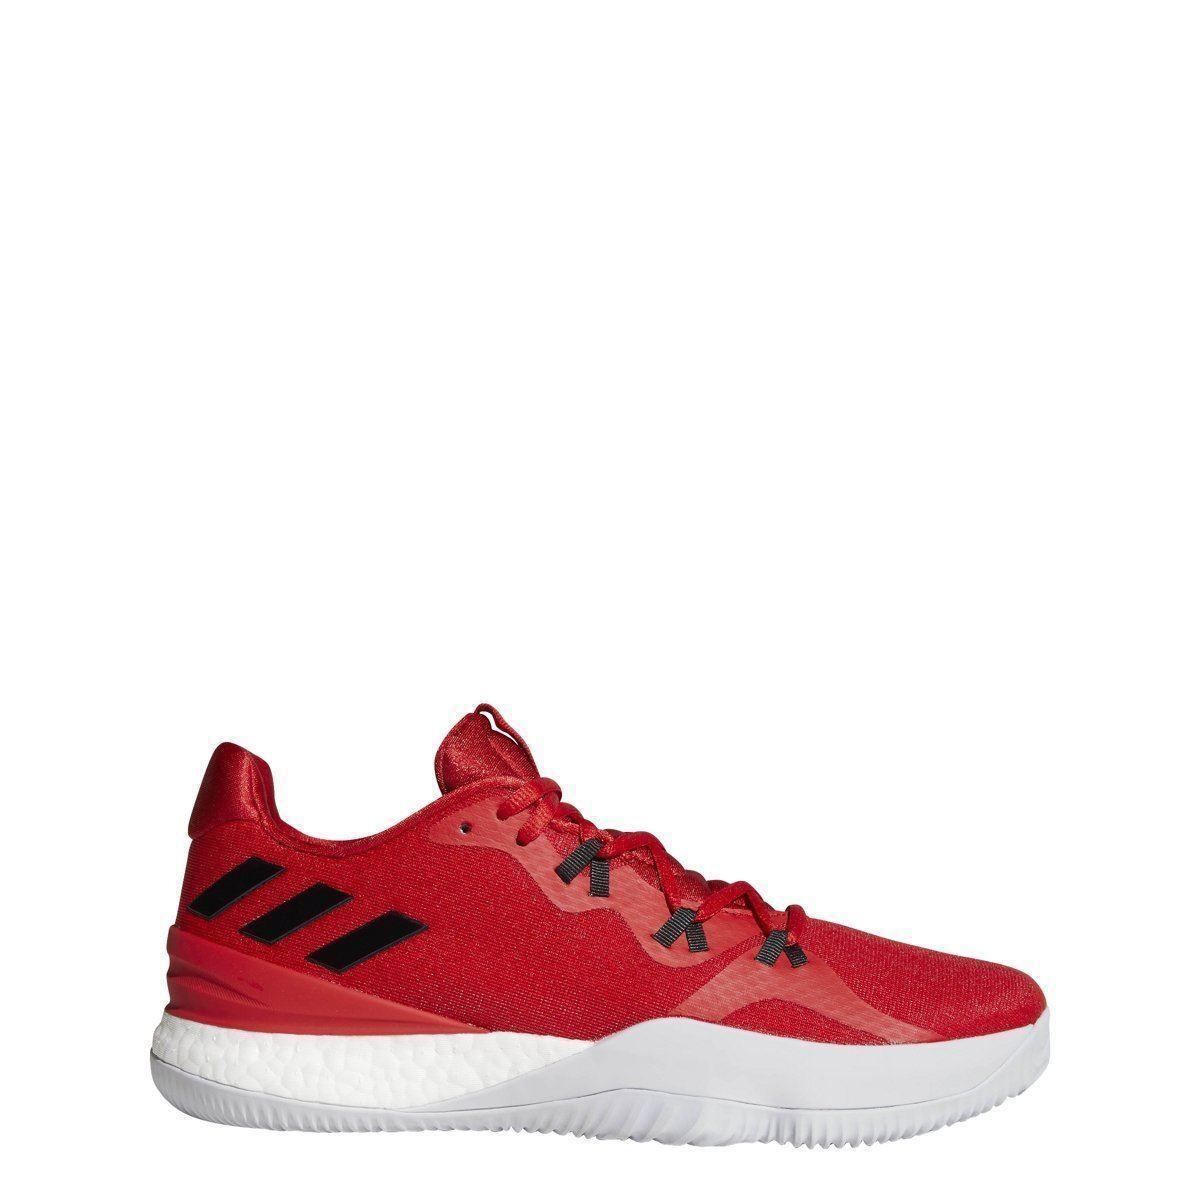 Adidas Crazy Light Boost 2018 Men's (Size 7.5 - 13) Scarlet White Black DB1069